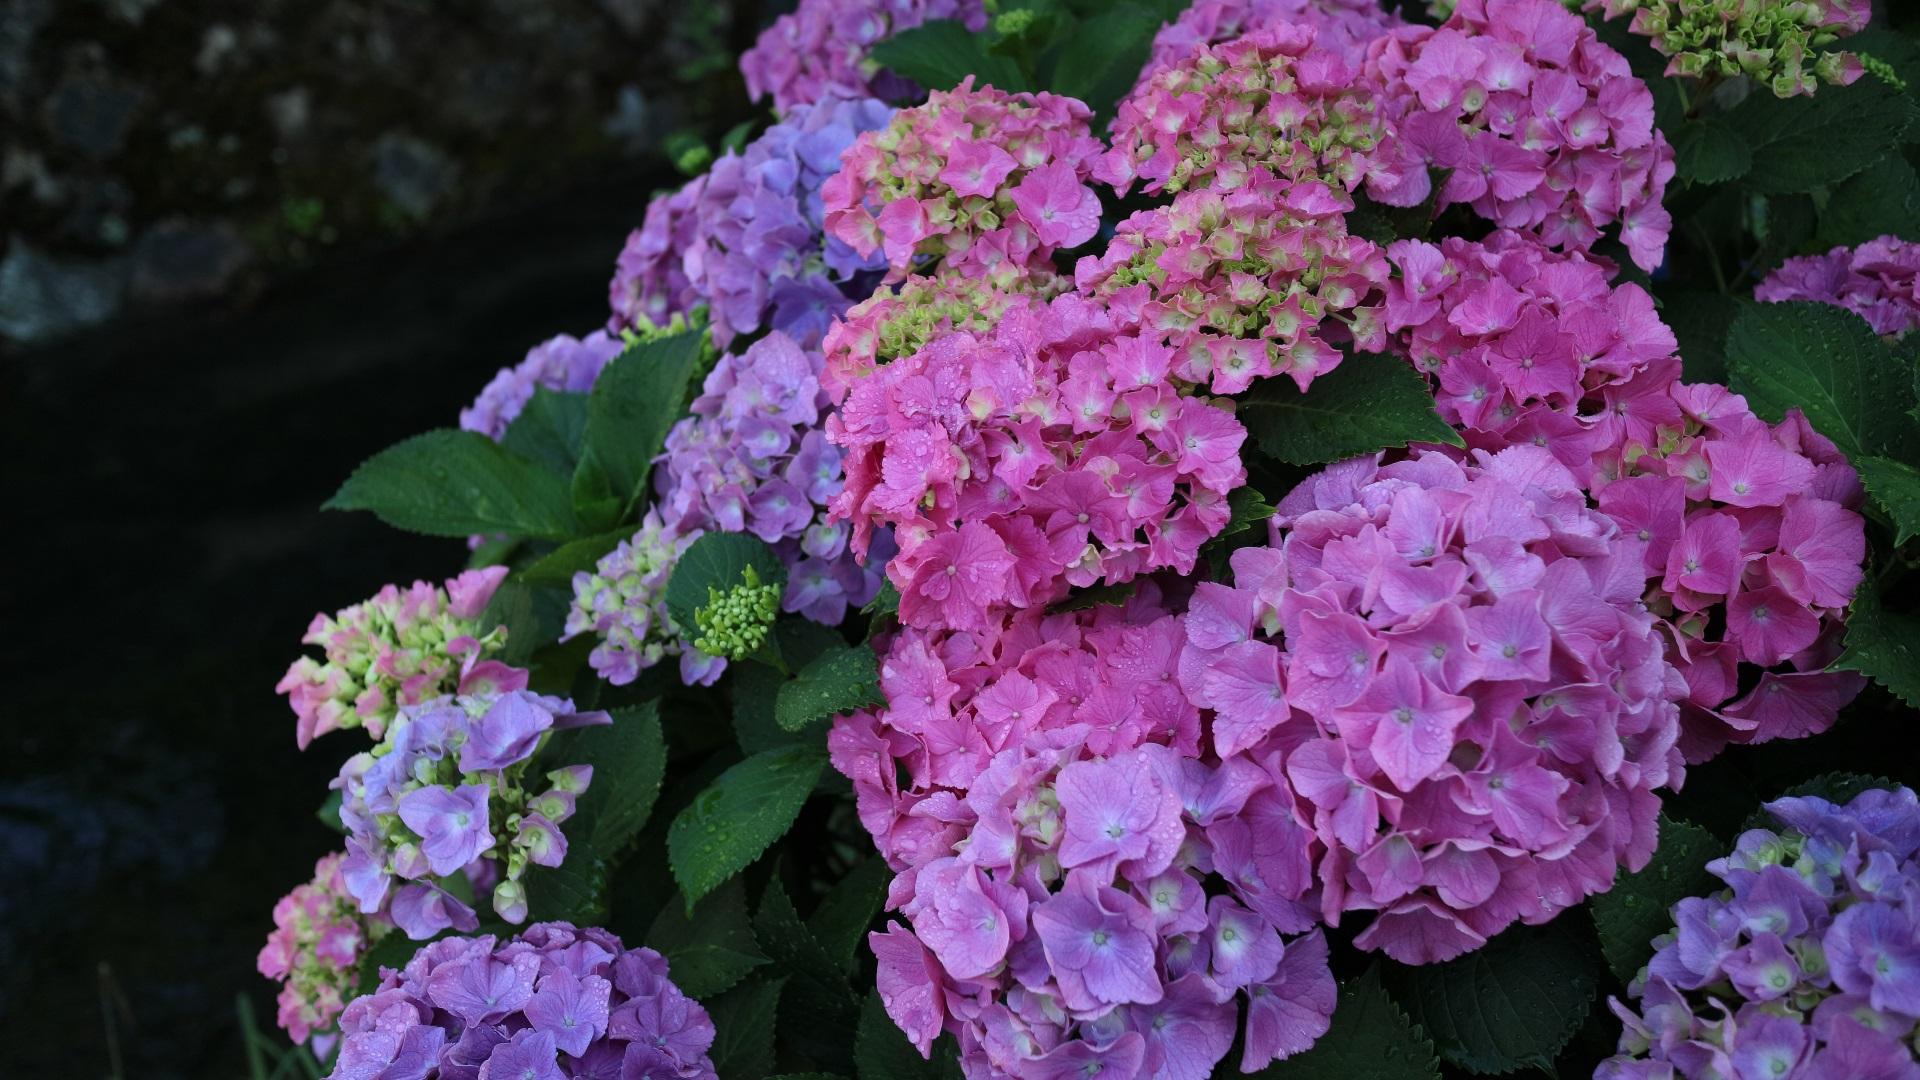 Beautiful Hydrangea Flowers Inflorescence Colorful 640x1136